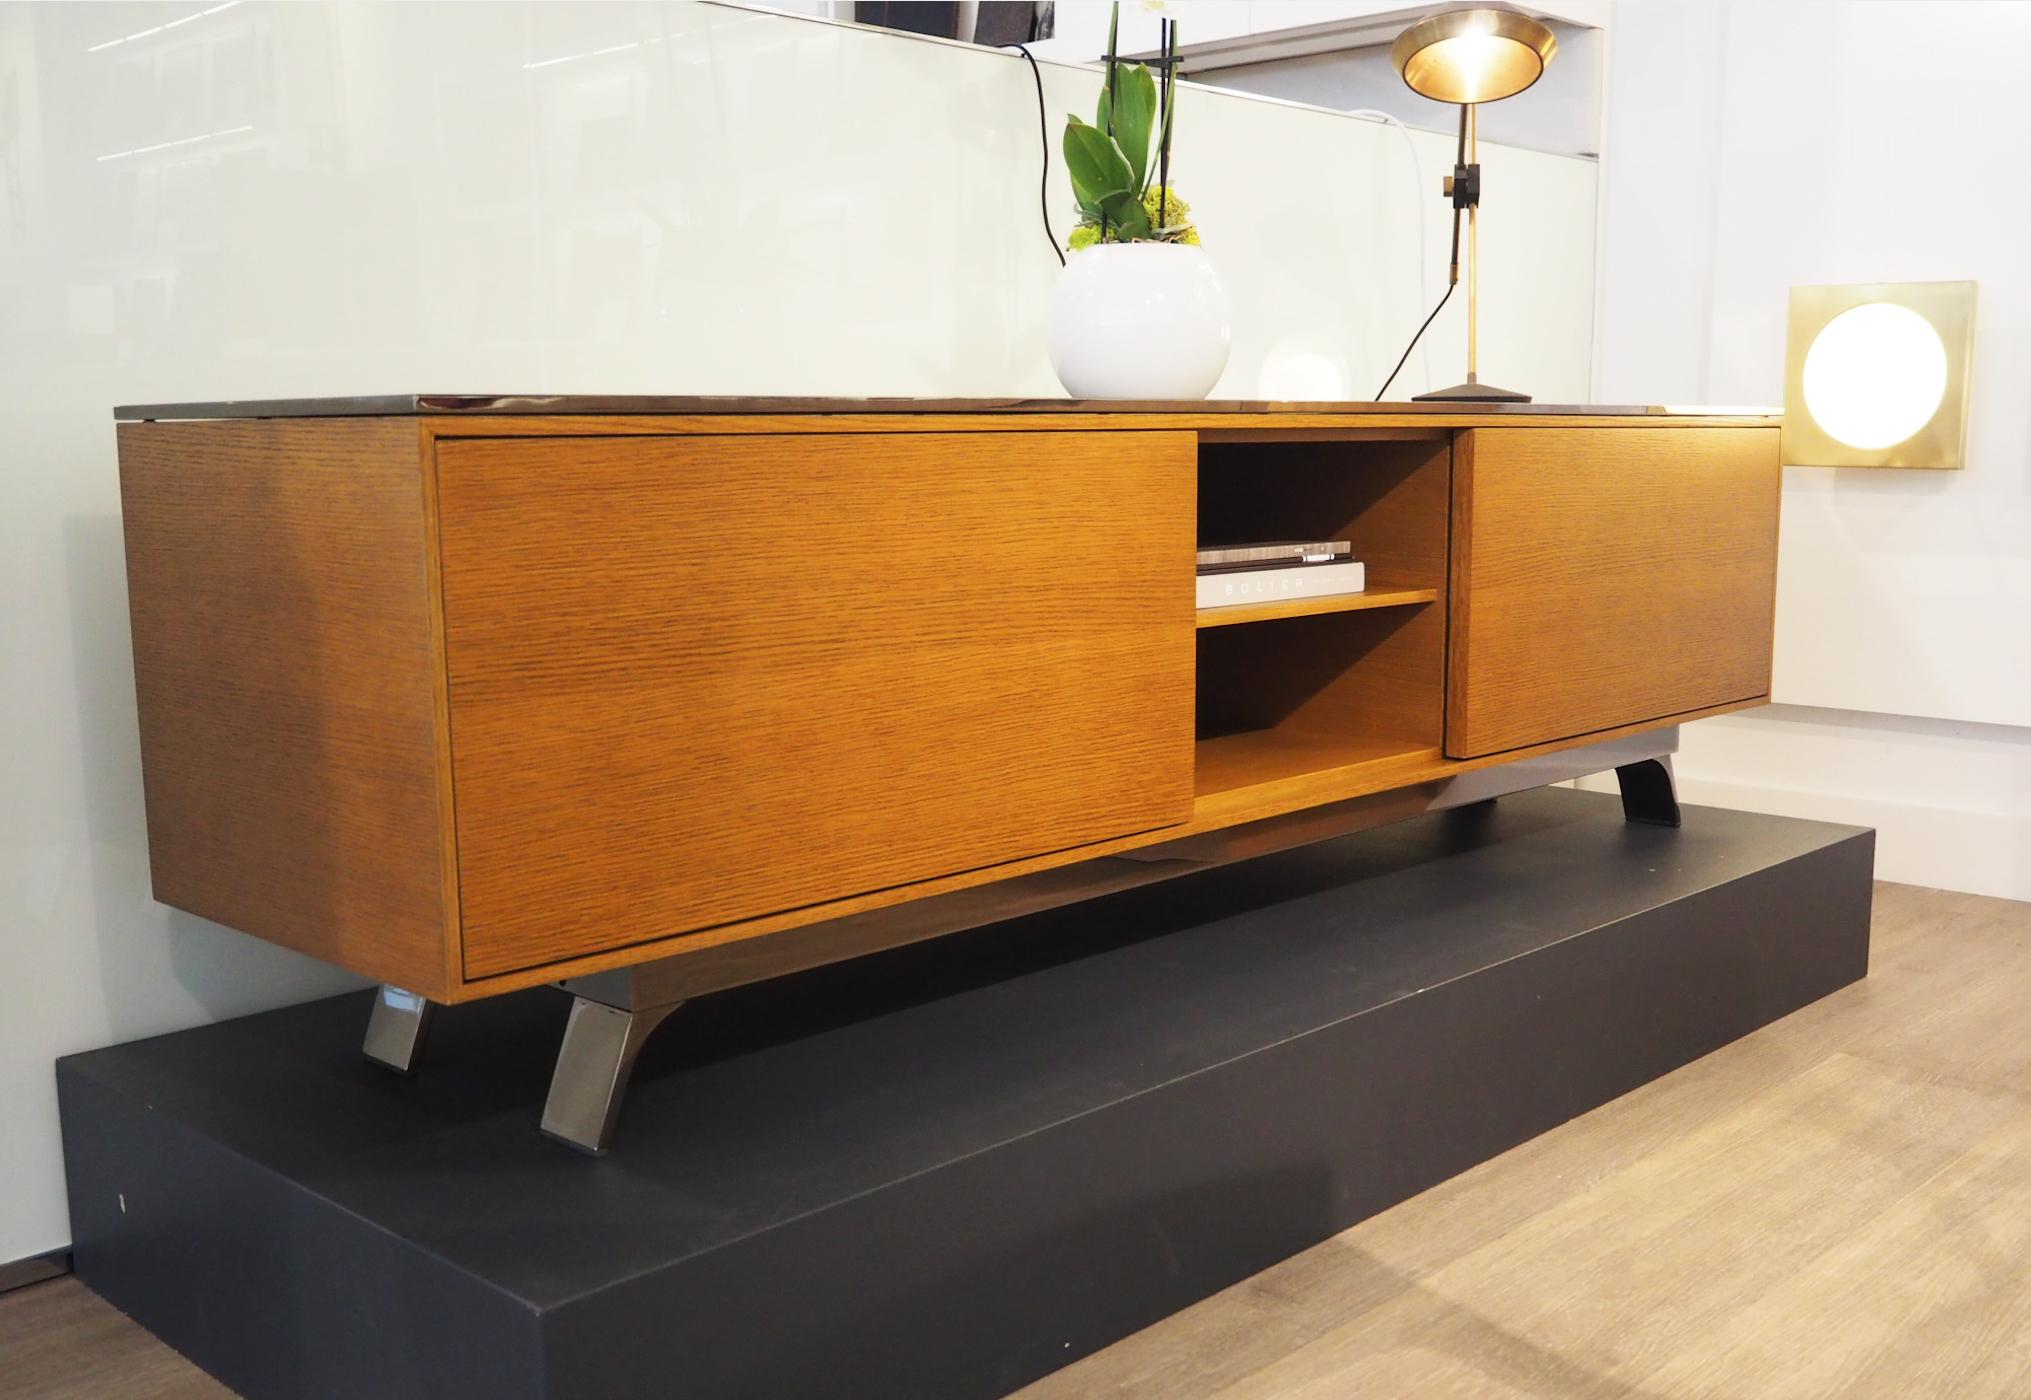 Gait-Conference-credenza-modern-office-furniture